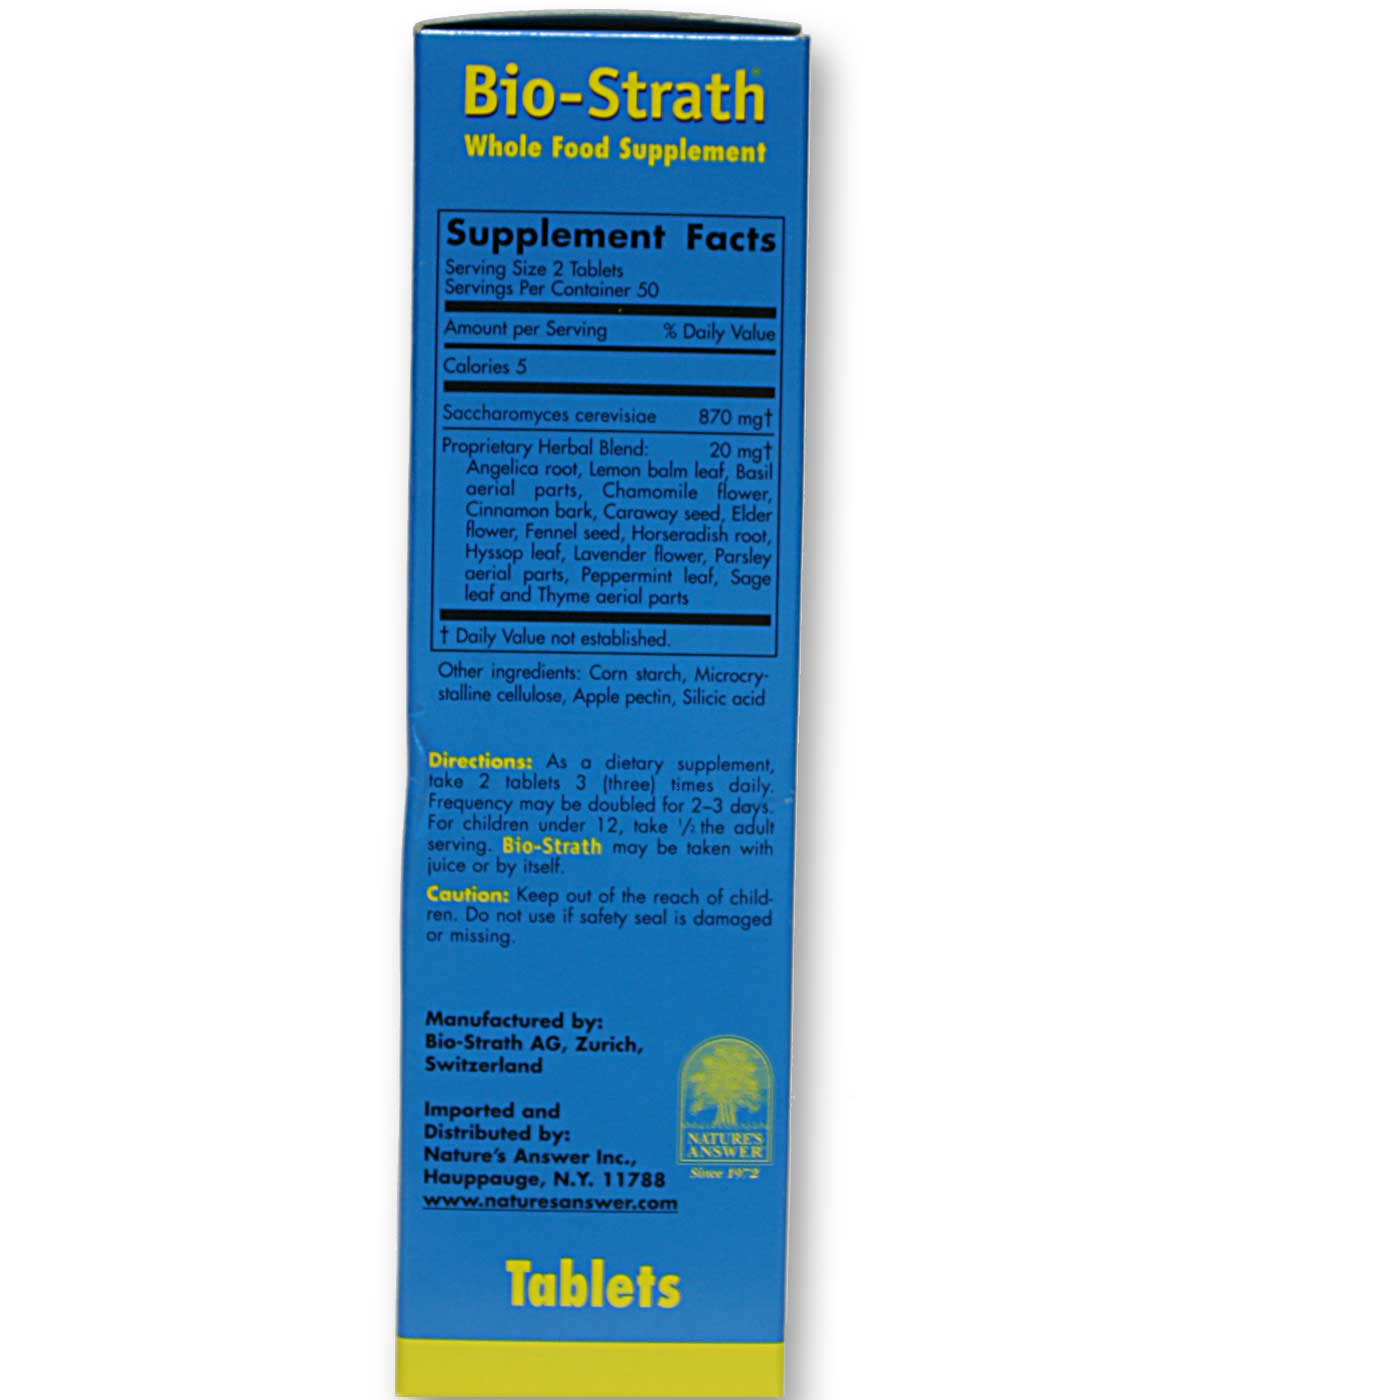 Bio-Strath Bio-Strath Tablets - 100 Tablets